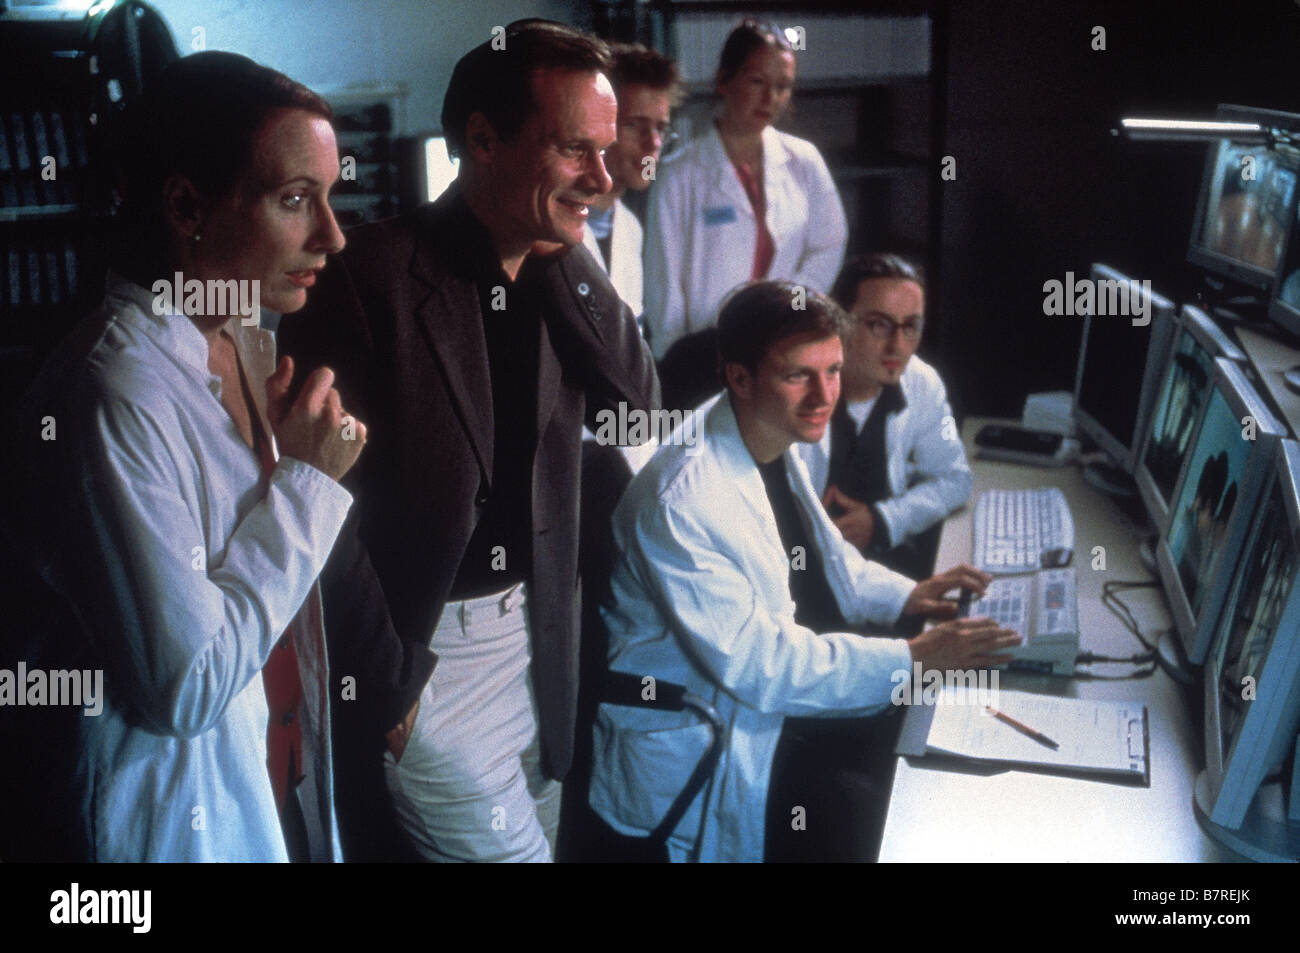 Andrea Sawatzki Experiment l'experience experiment, das year: 2001 - germany edgar